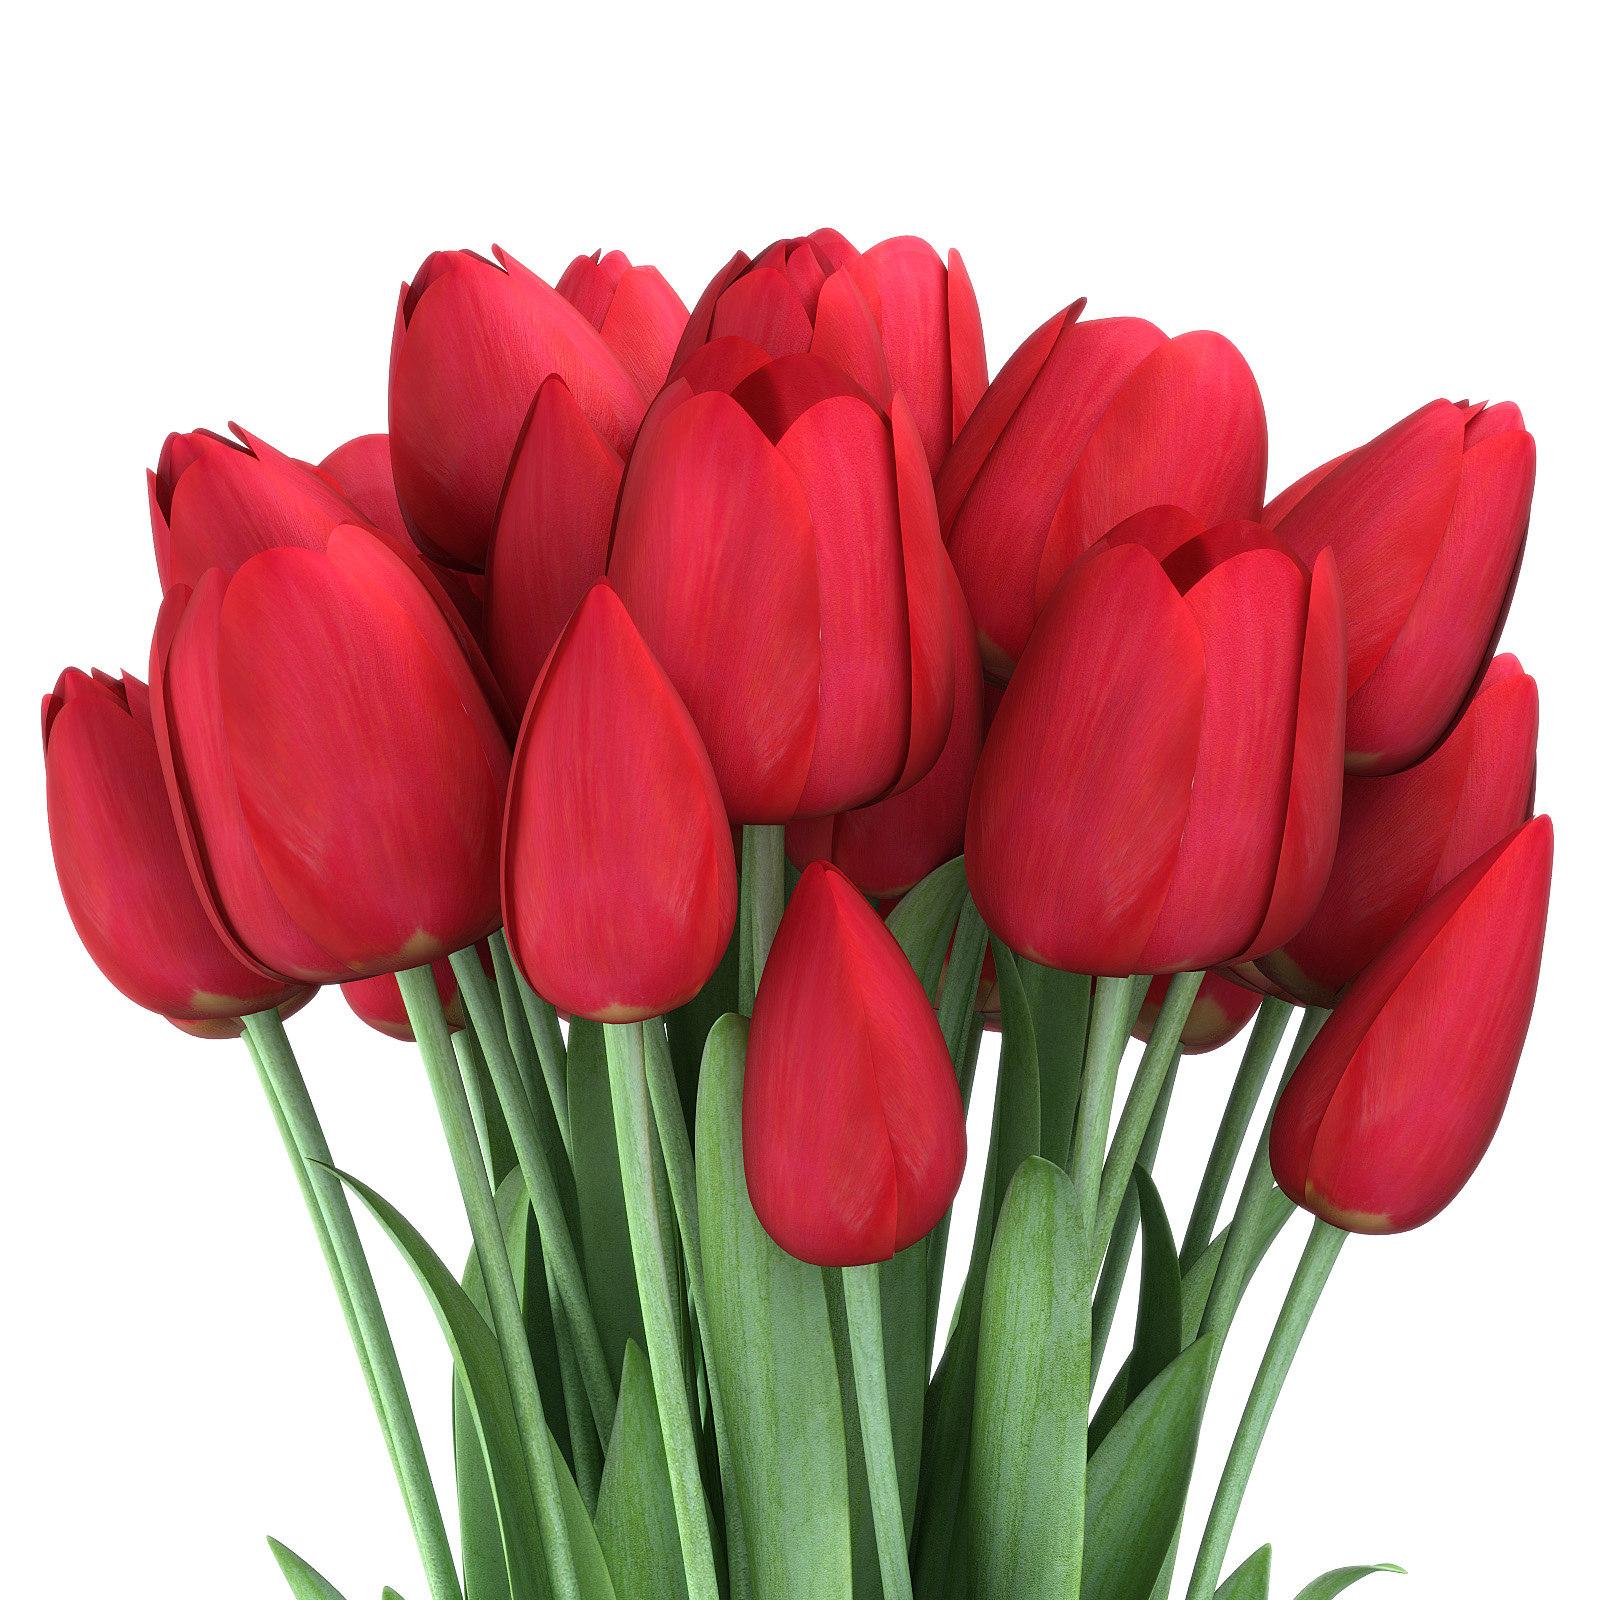 Tulips_3_red.jpg